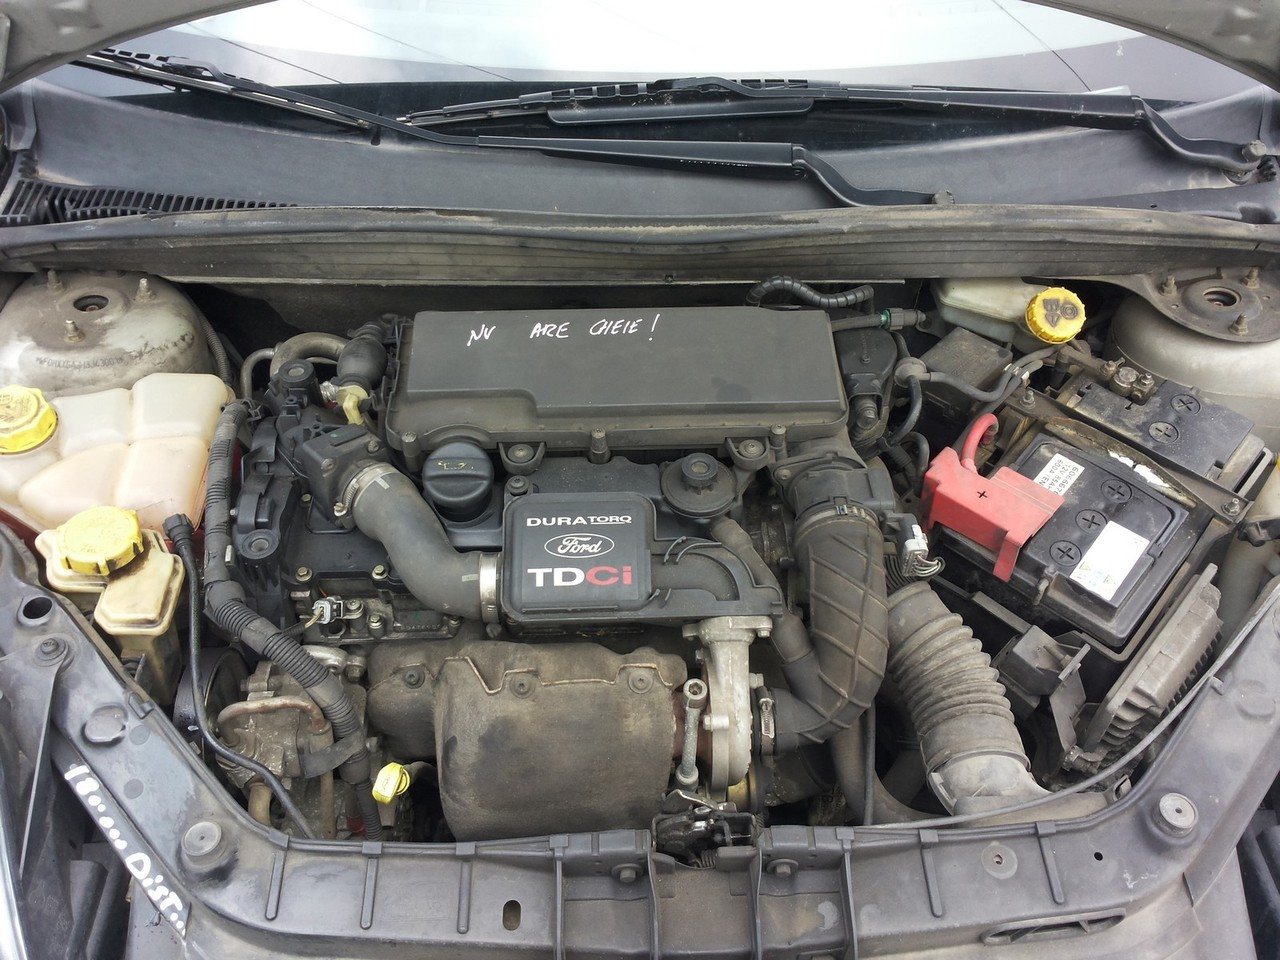 electroventilator cu suport Ford Fiesta V 1.4tdci an fabricatie 2002 2003 2004 2005 2006 2007 2008